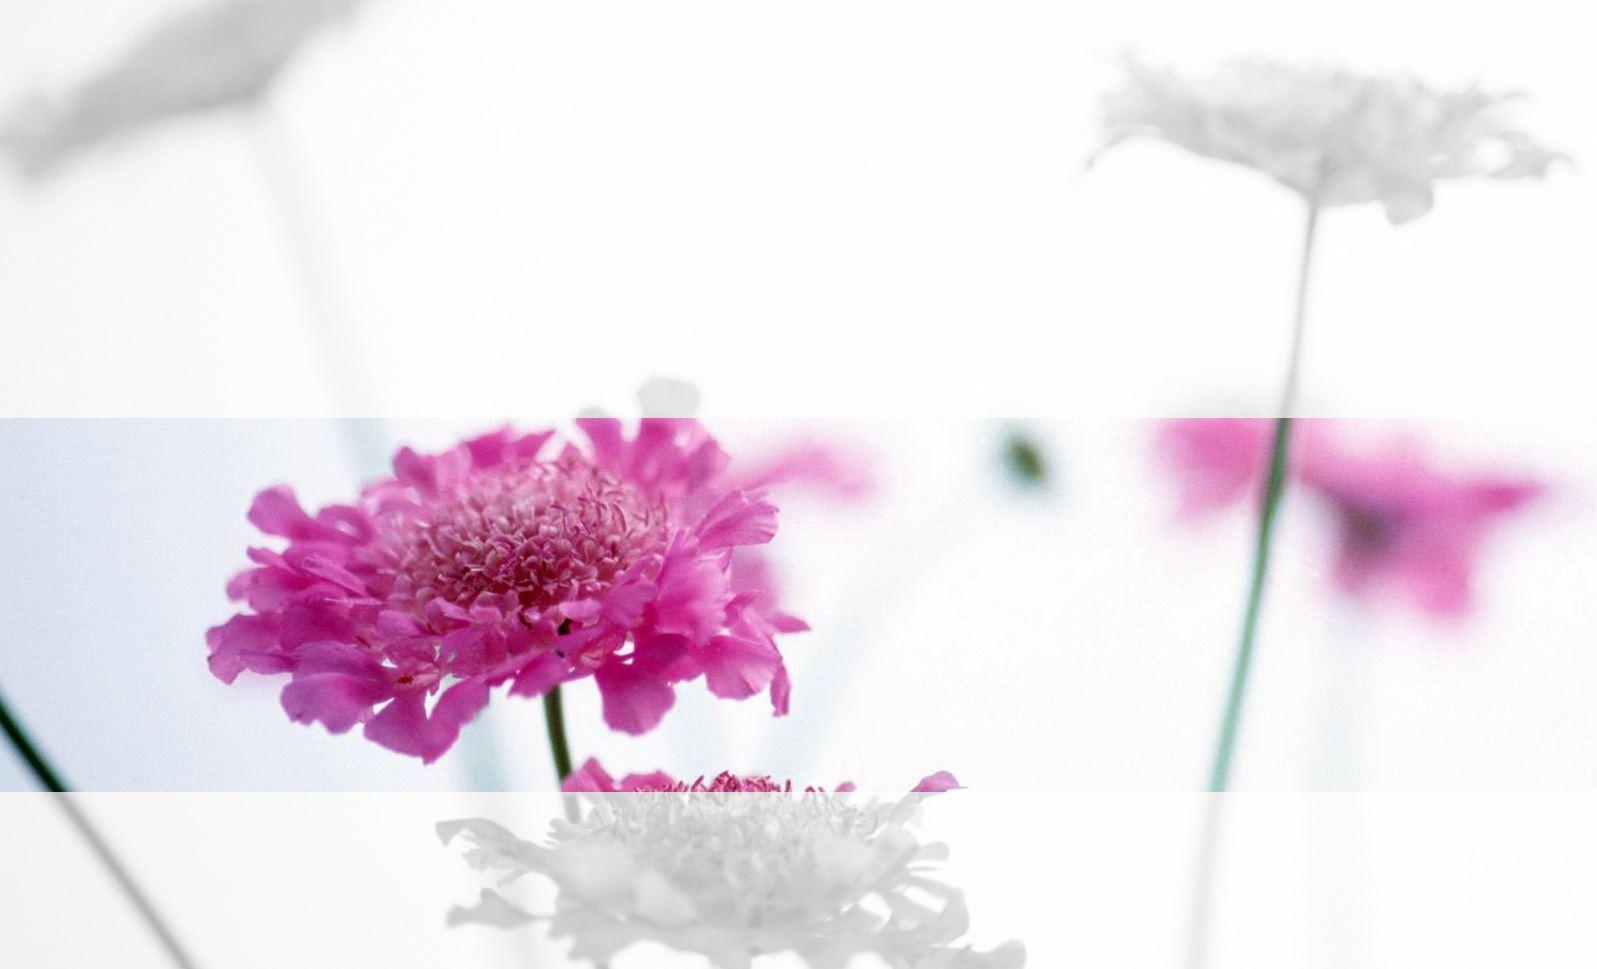 Flower_fade3.JPG